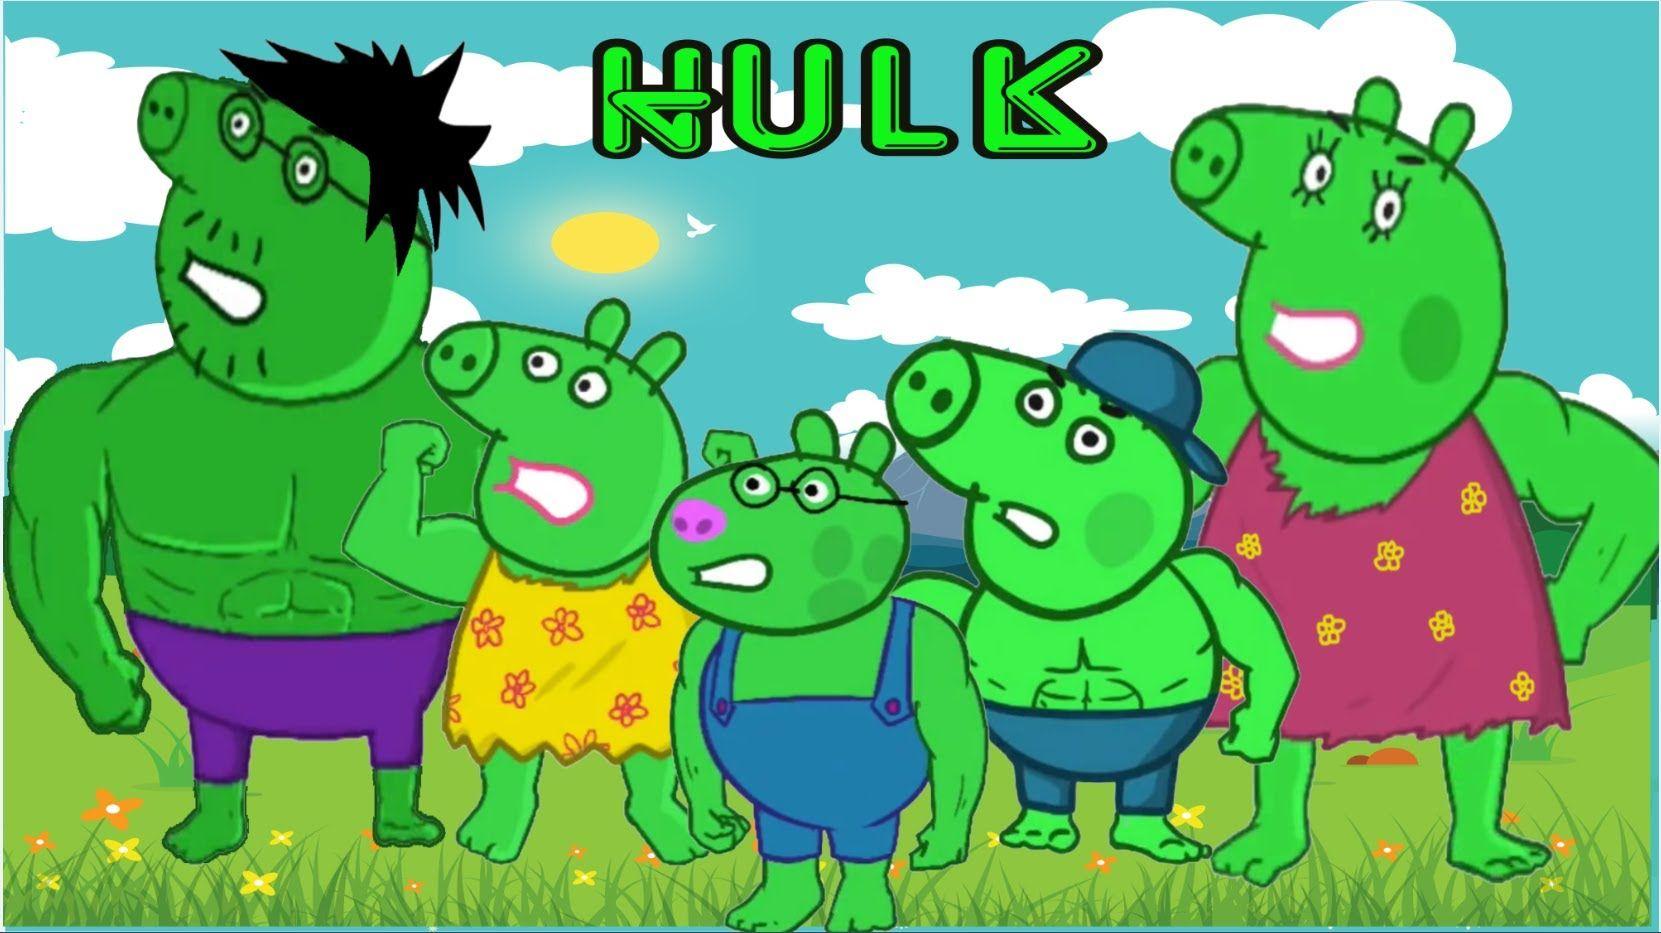 Peppa Pig Hulk Finger Family Nursery Rhymes Lyrics Peppa Pig